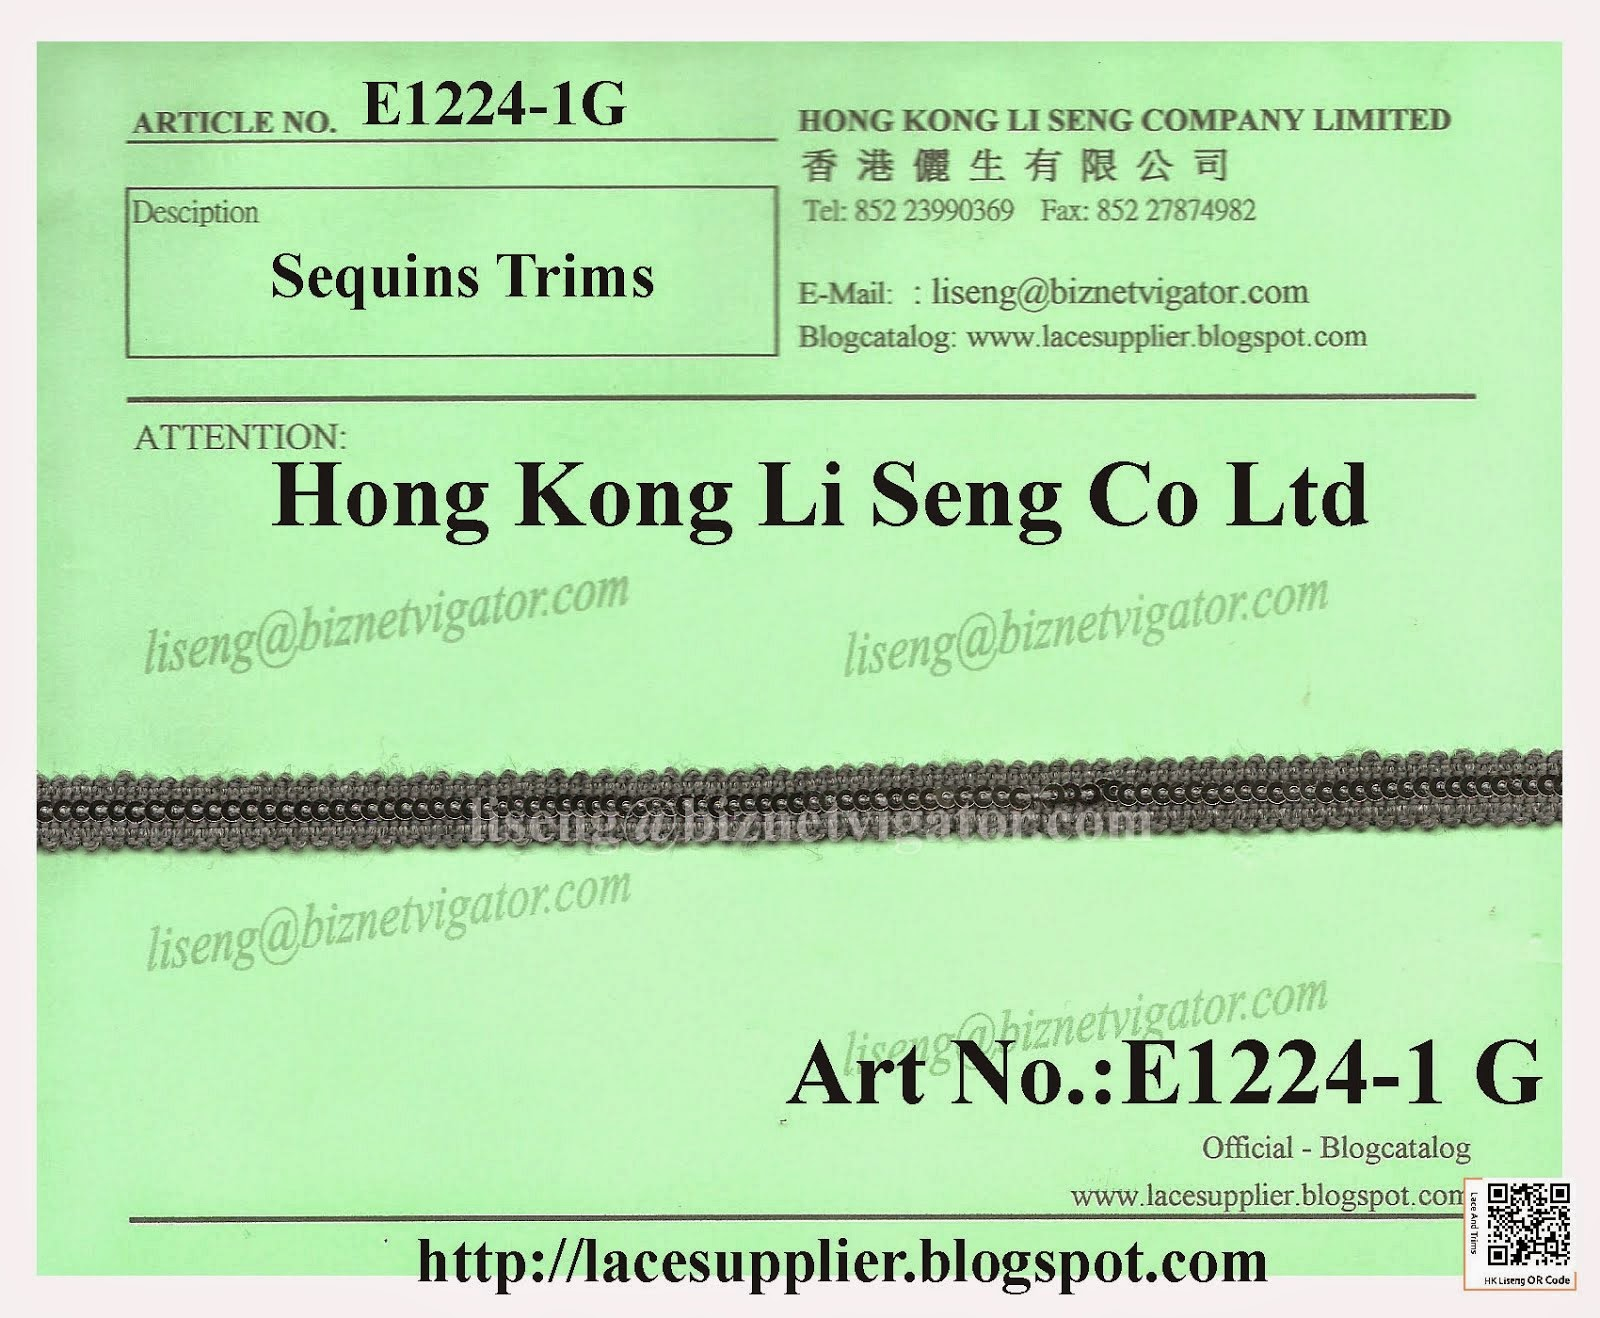 Sequins Trims Manufacturer Wholesale Supplier - Hong Kong Li Seng Co Ltd